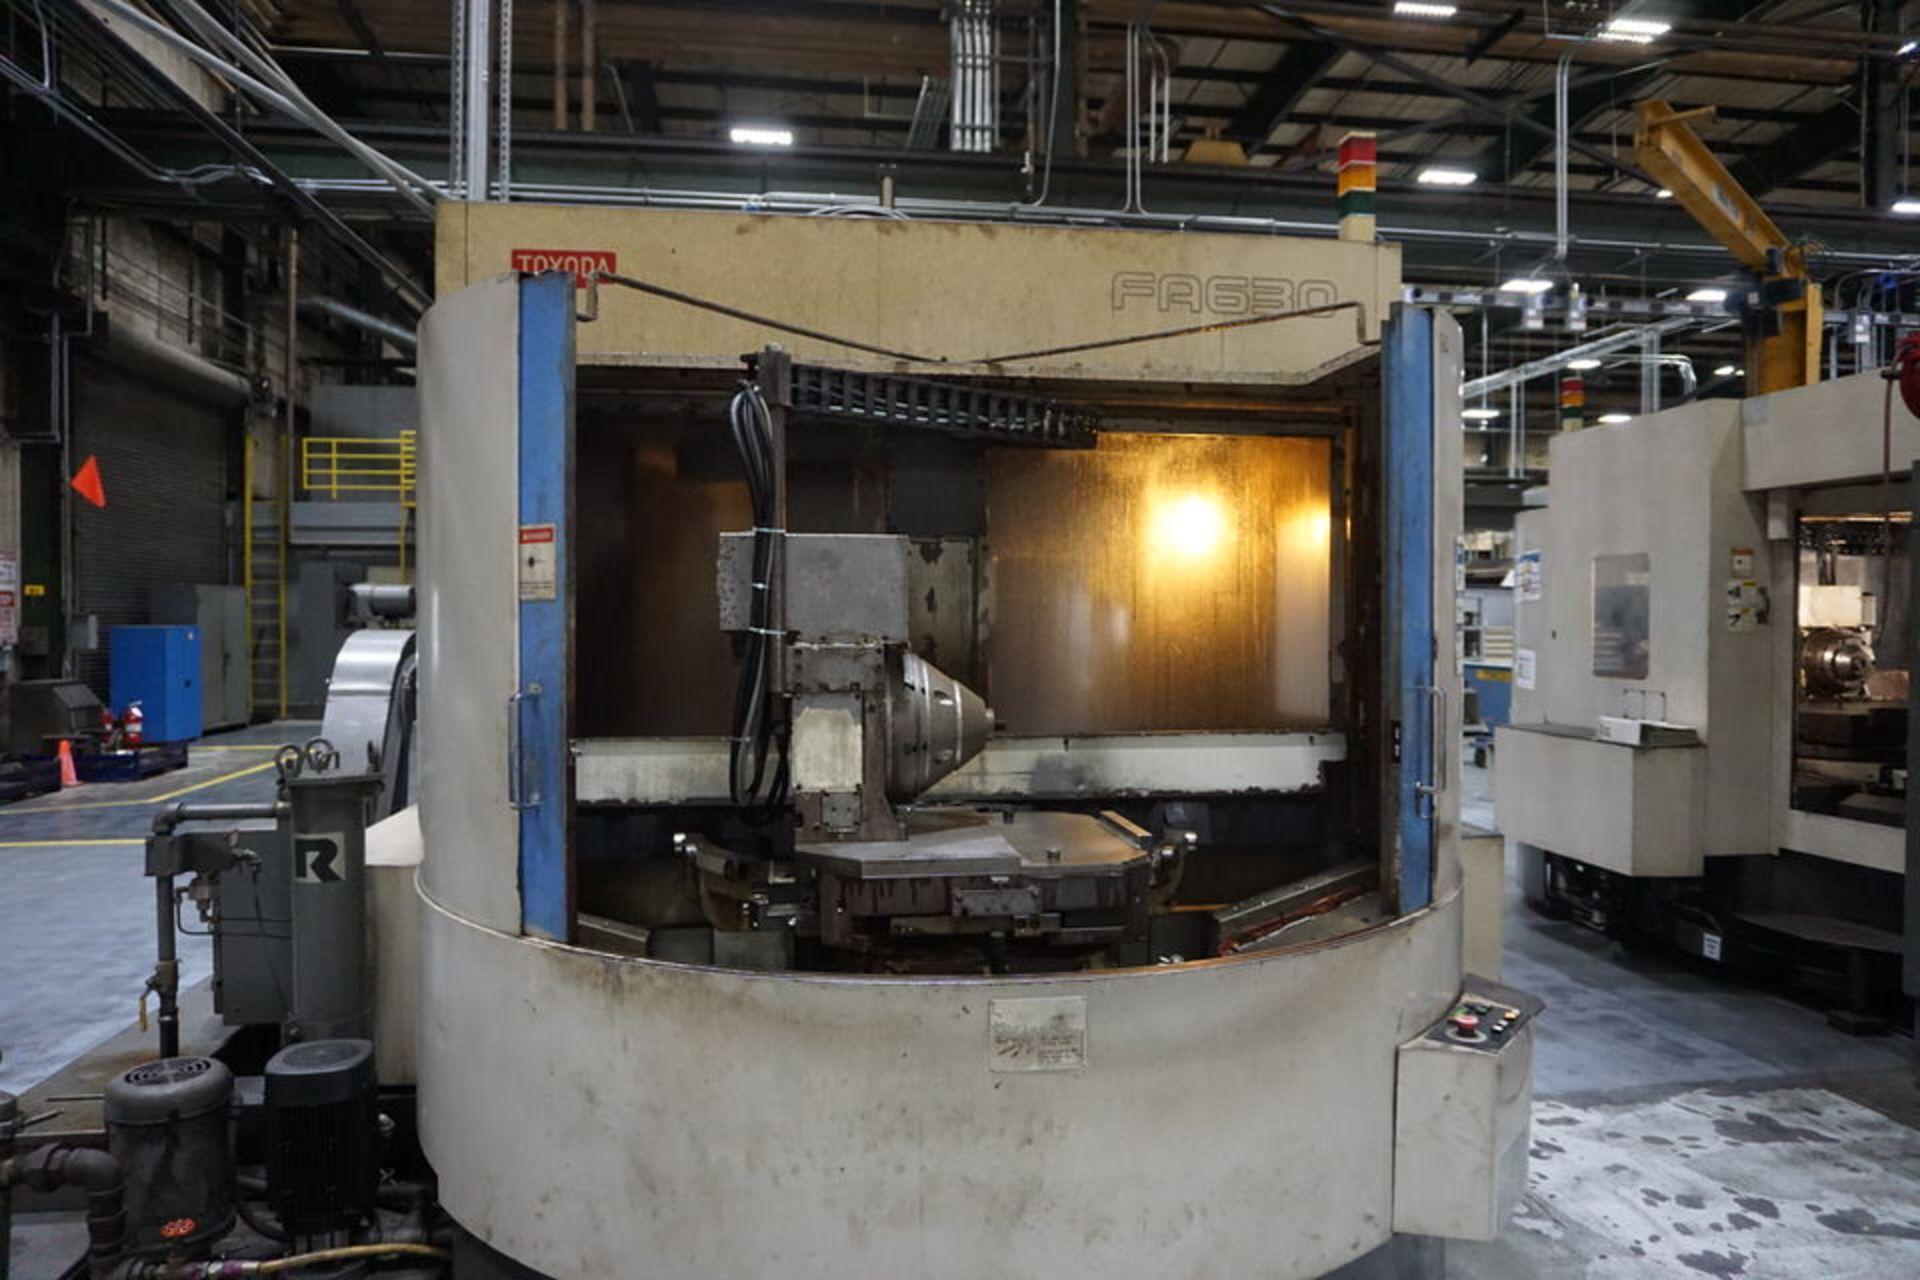 TOYODA HORIZONTAL MILLING MACHINE, DOM:1998 (ASST#: P772100) - Image 3 of 9